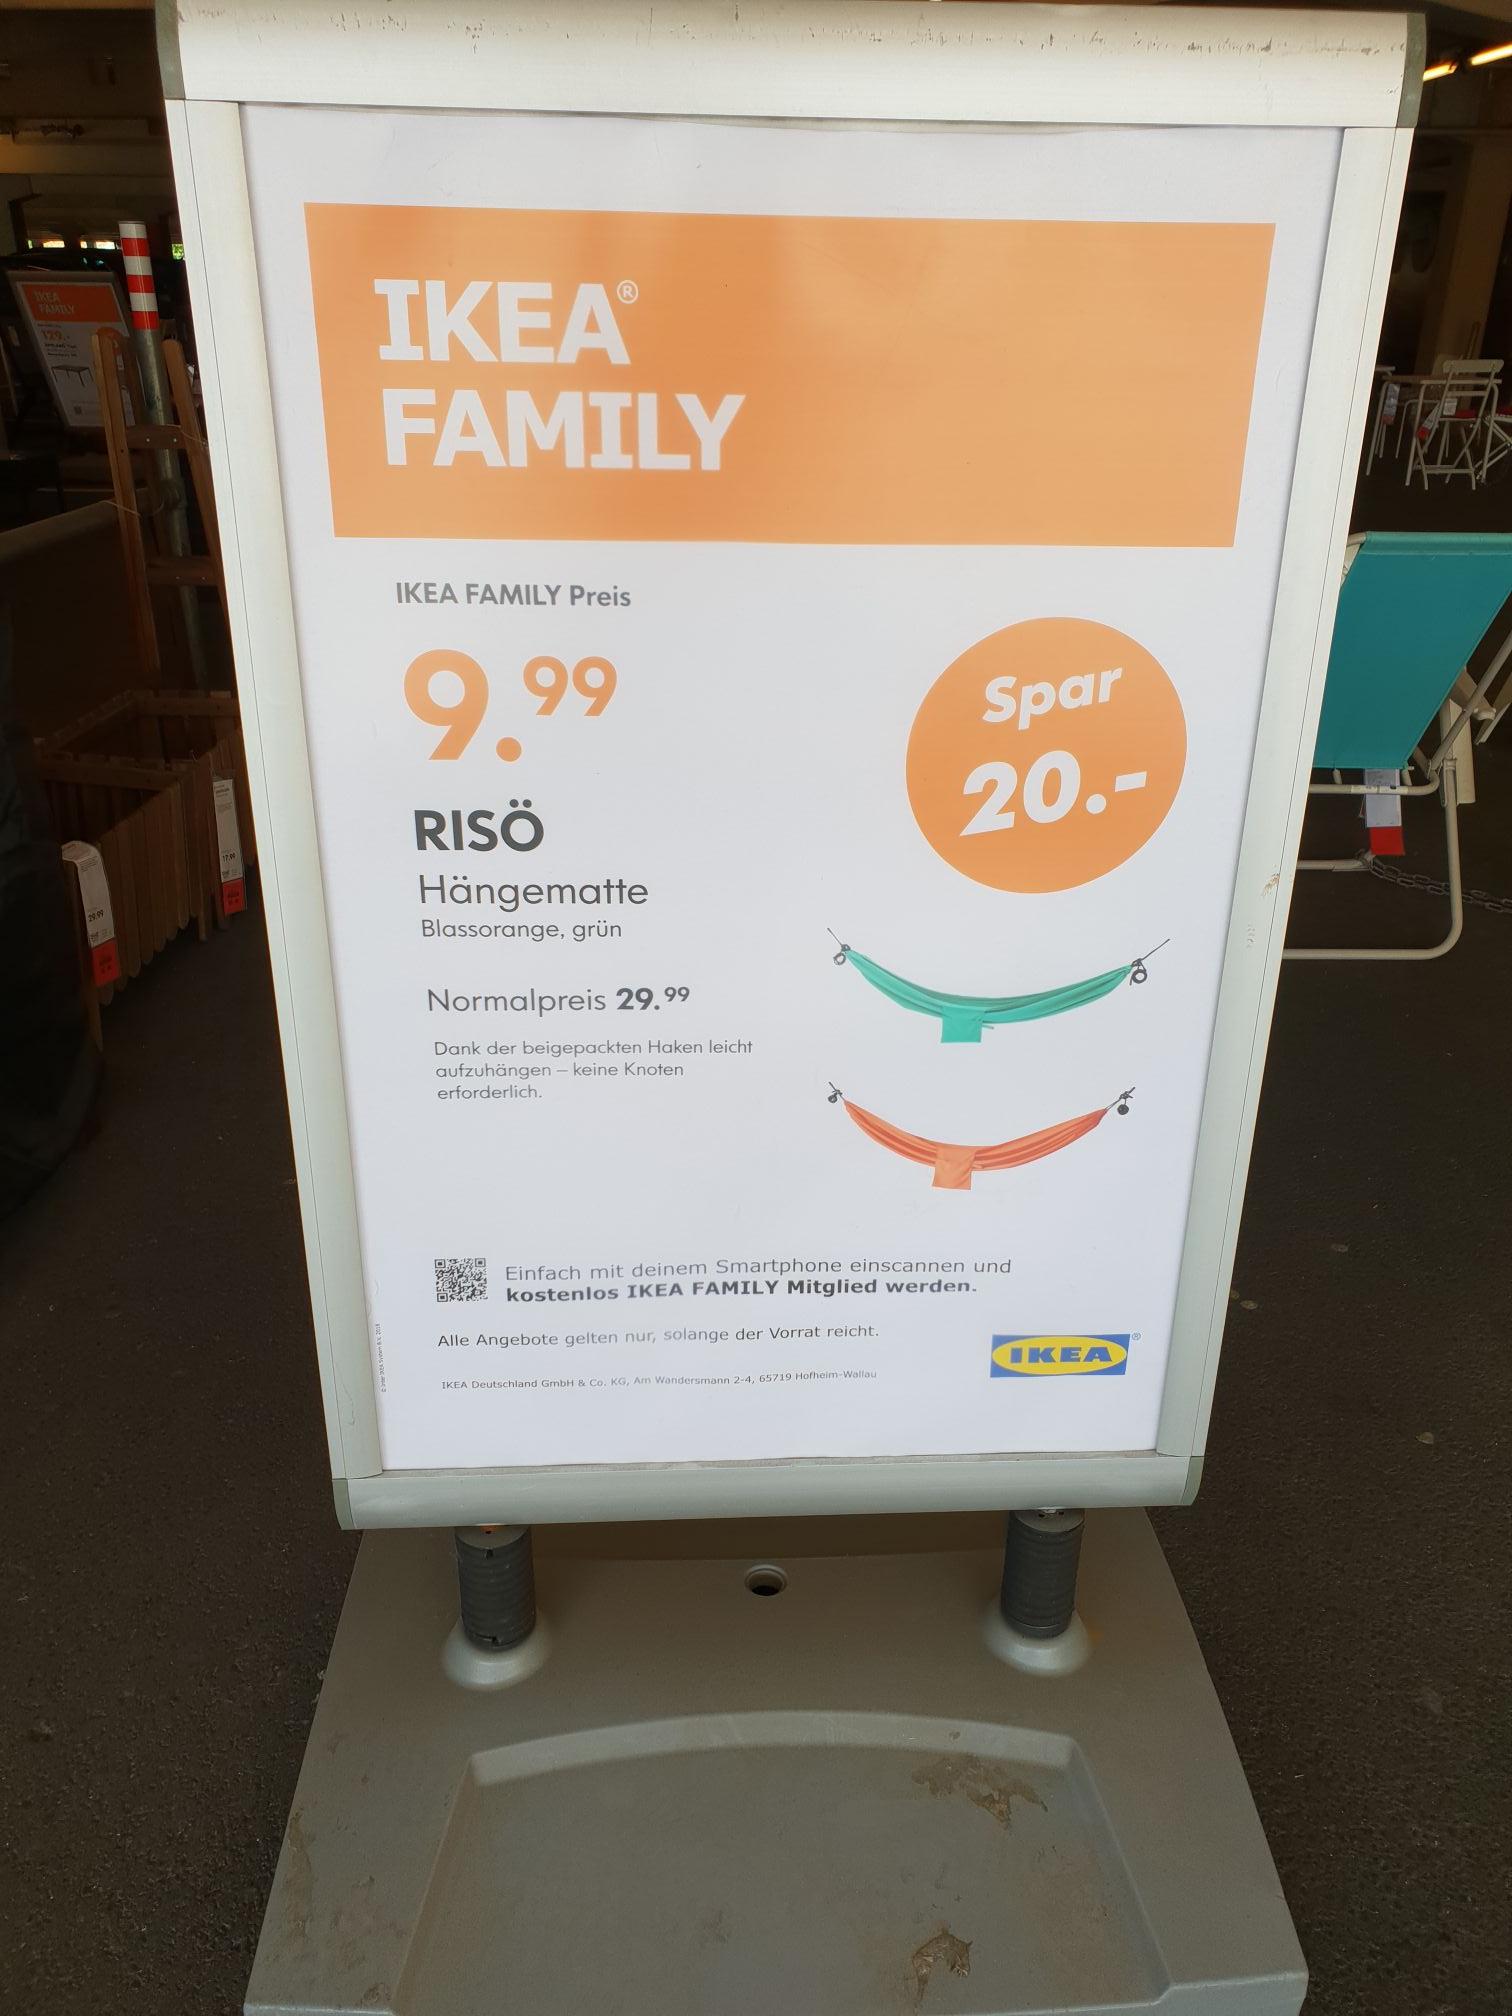 [Köln Butzweilerhof] IKEA Family Risö Hängematte 9.99 Euro anstatt 29.99 Euro